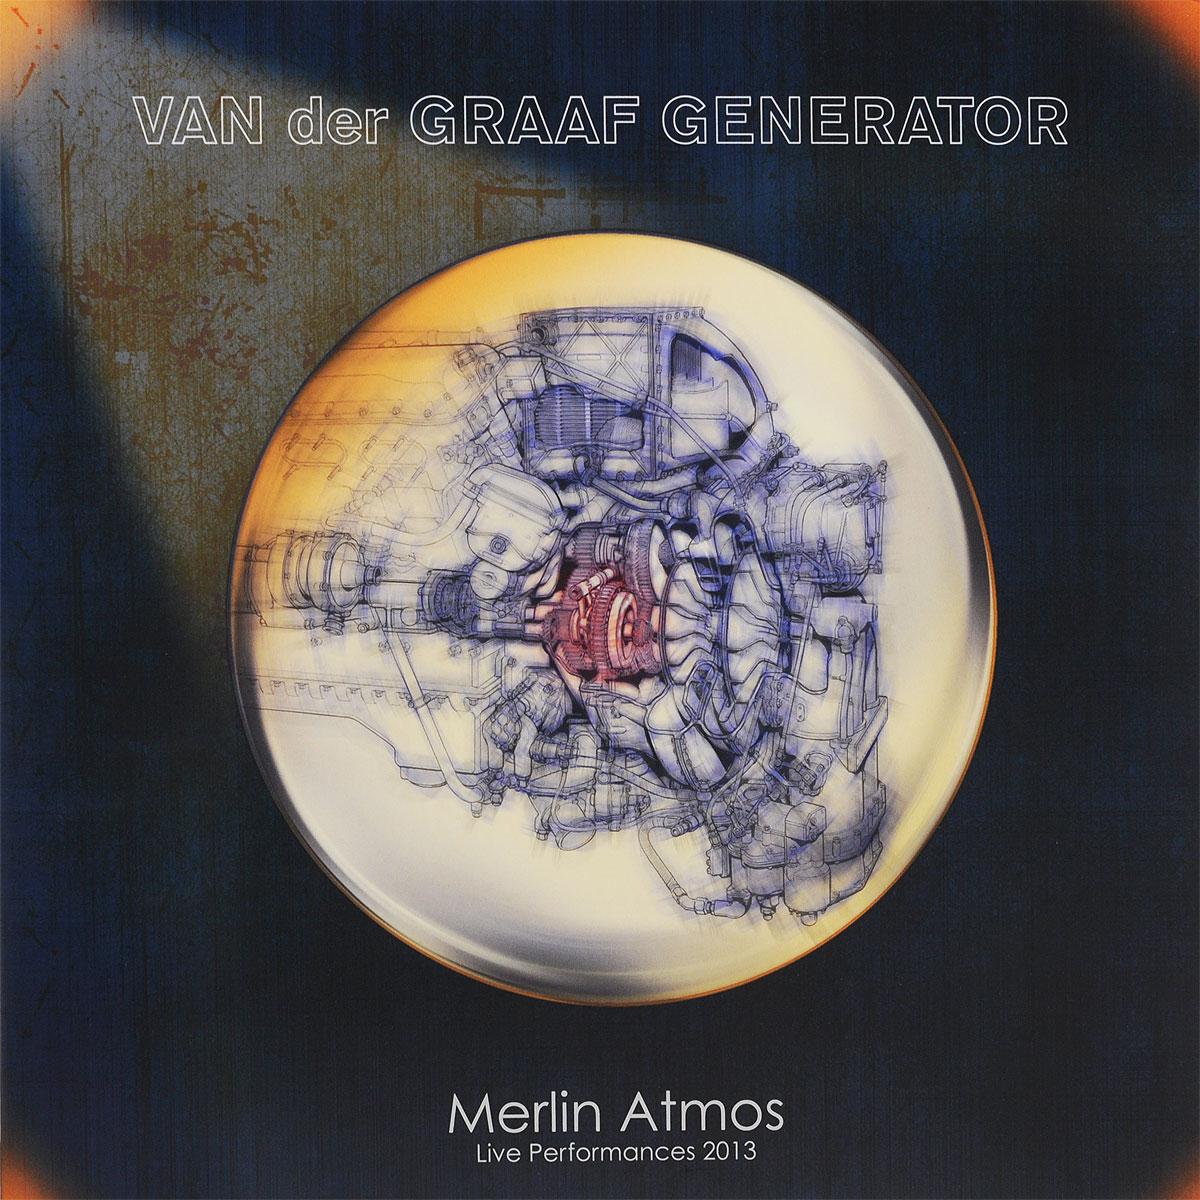 Van Der Graaf Generator Van Der Graaf Generator. Merlin Atmos. Live Performances 2013 (LP) van der graaf generator van der graaf generator after the flood at the bbc 1968 1977 2 cd